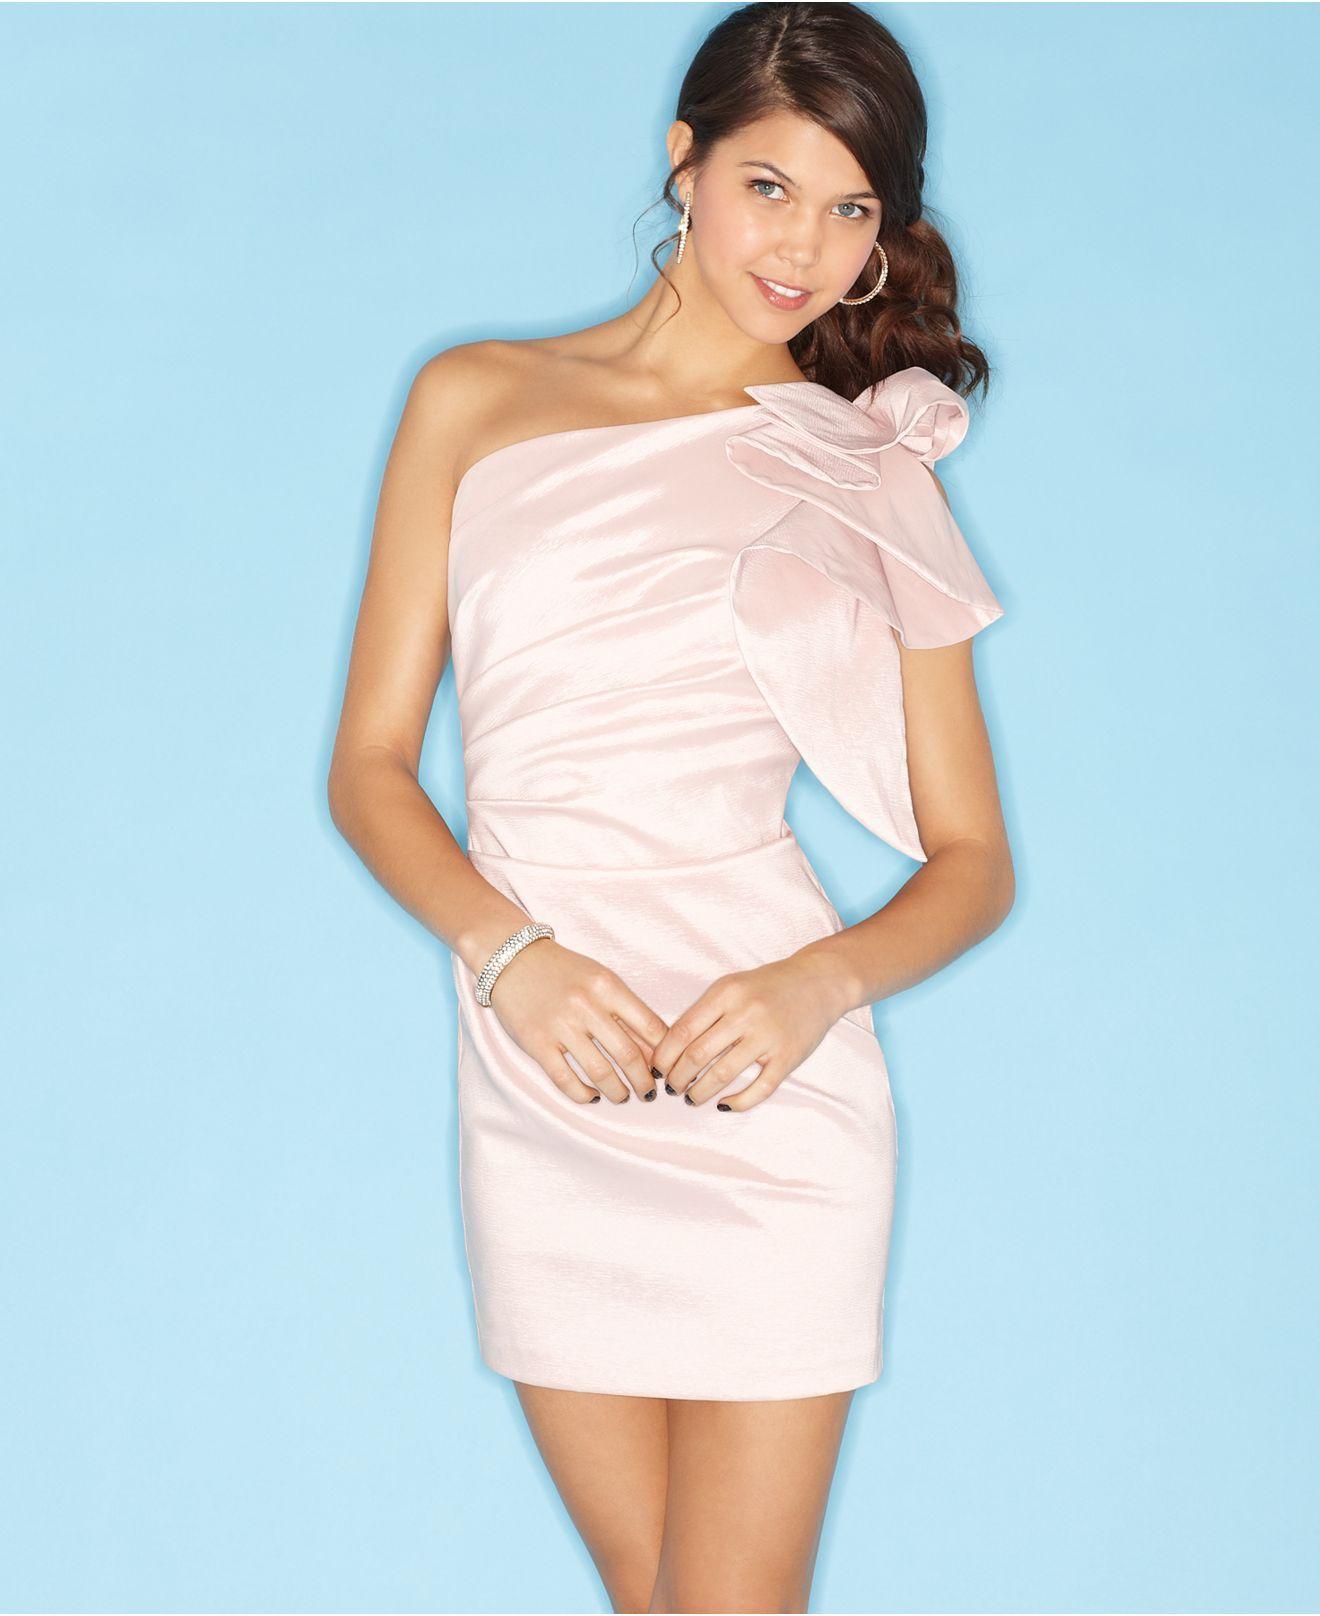 Blush dress dresses blush dresses junior dresses